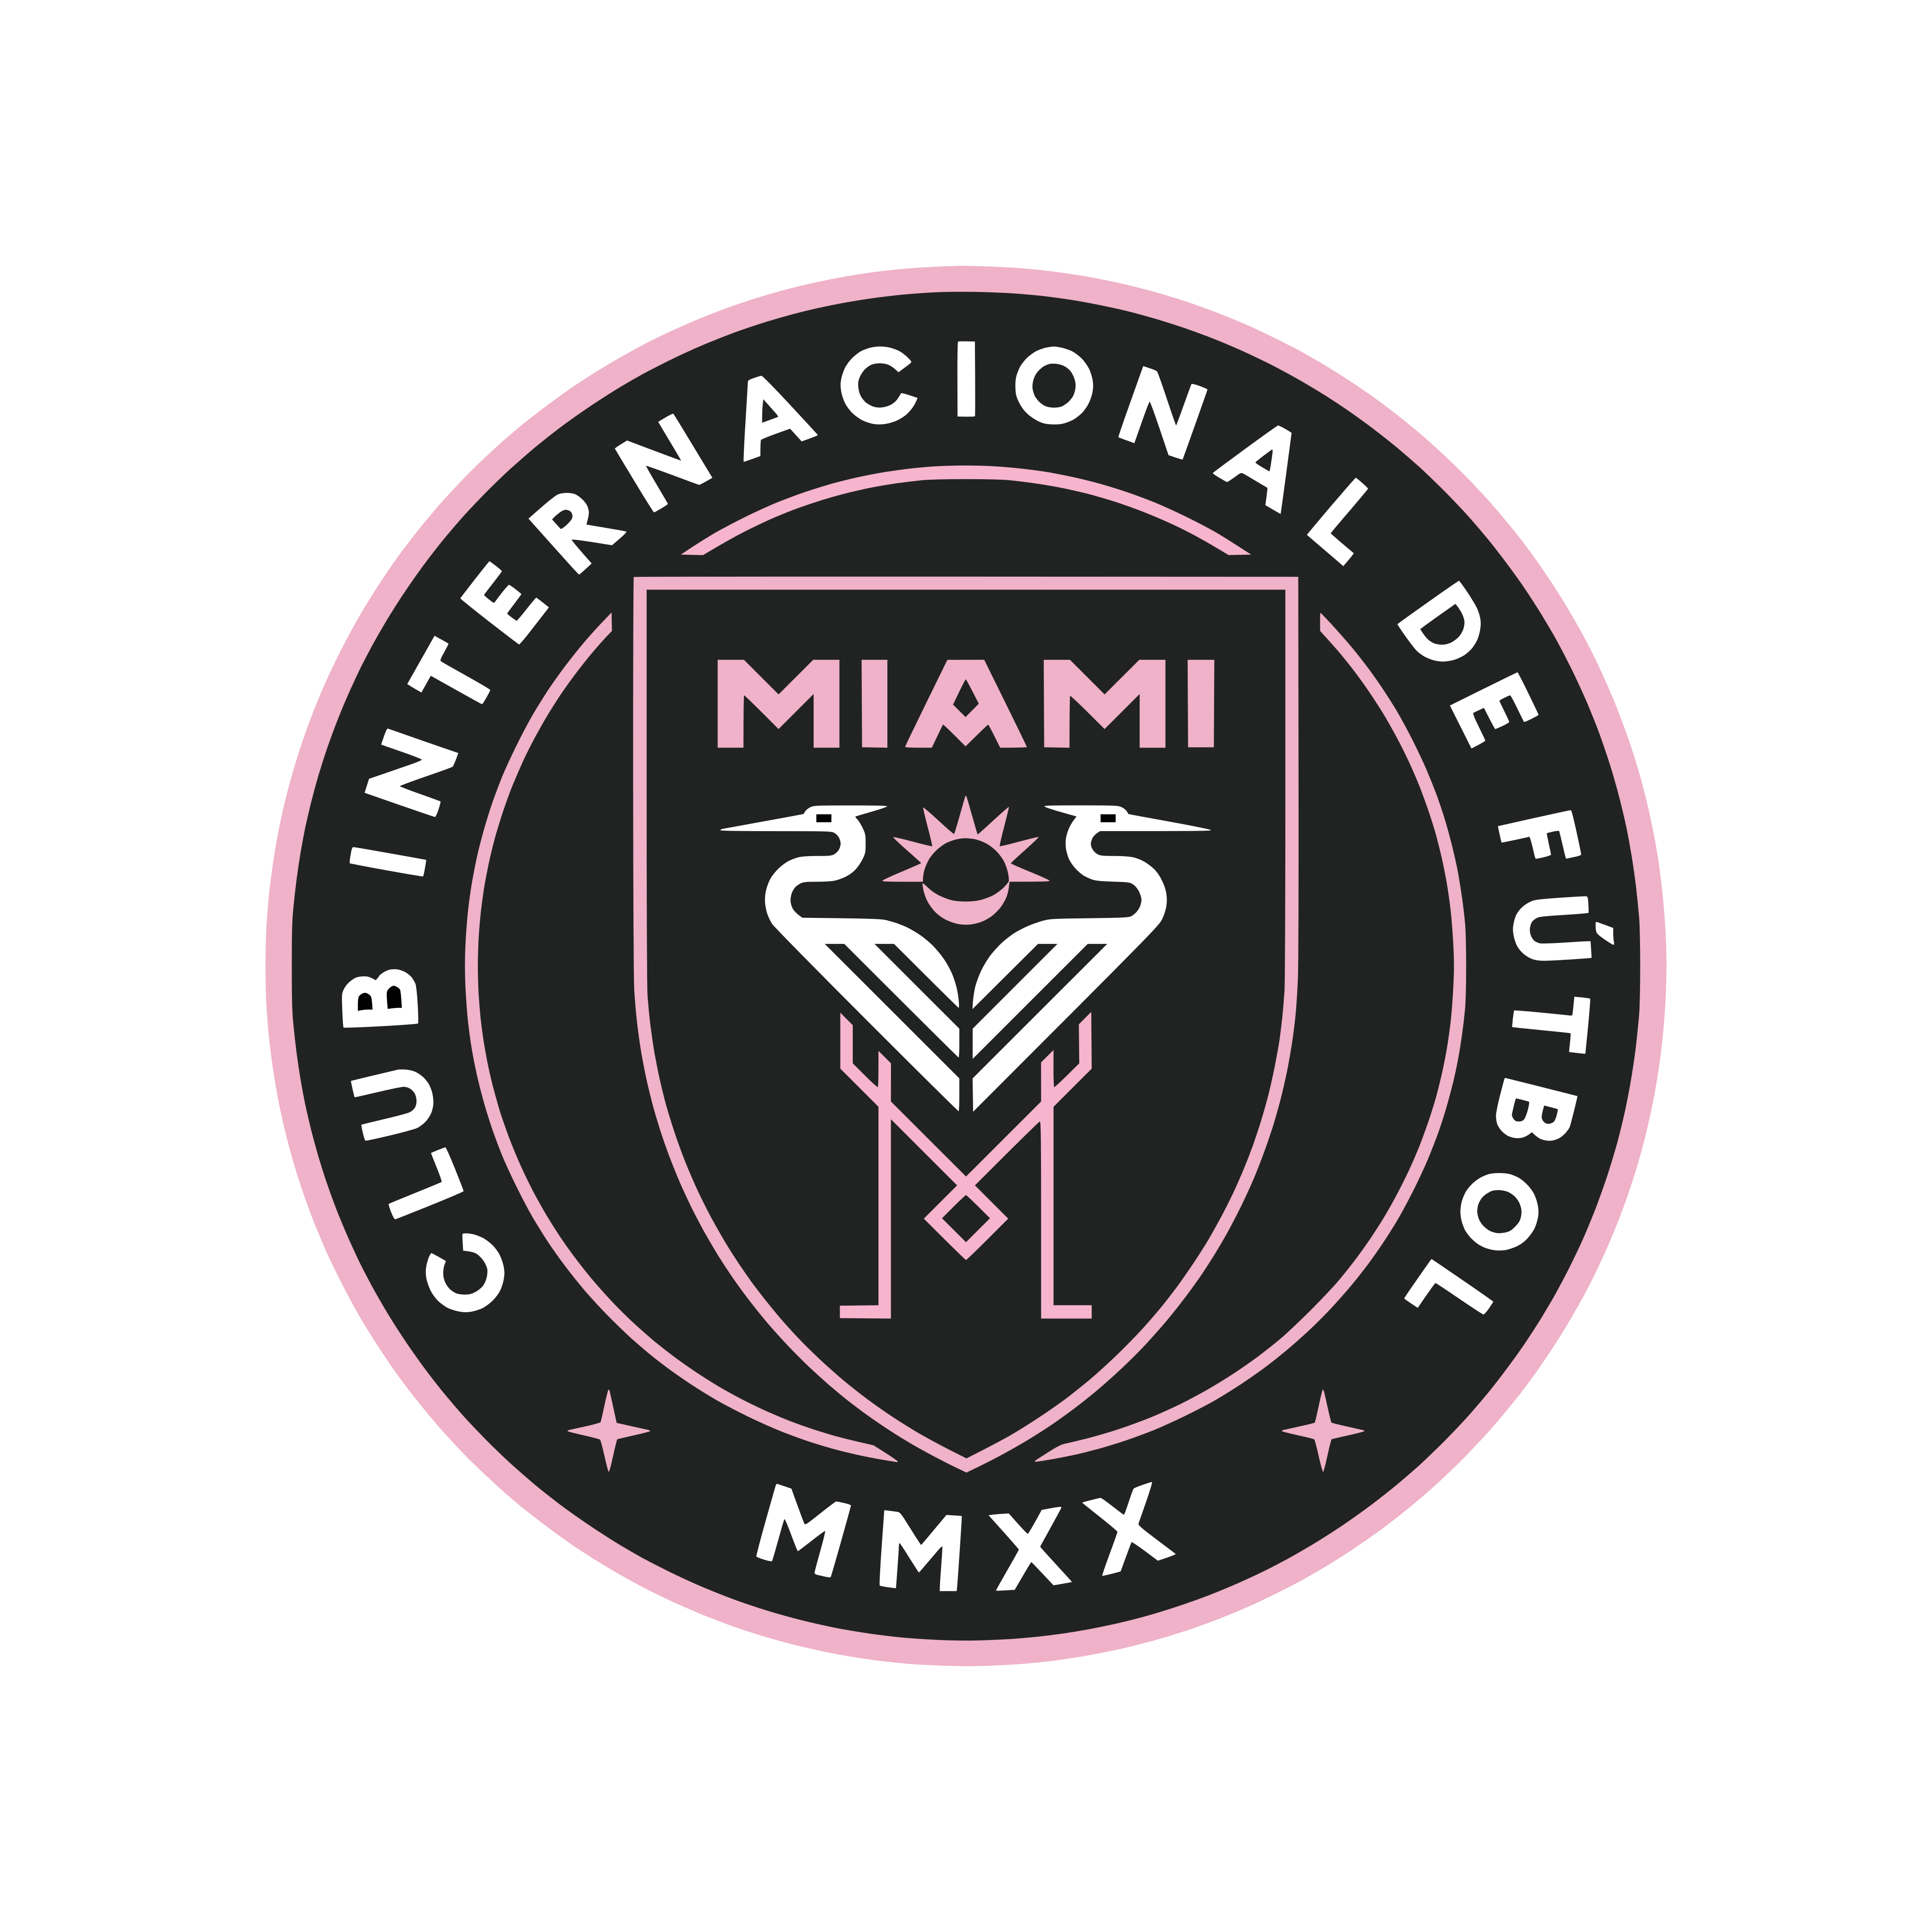 Inter miami cf logo 0 - Inter Miami CF Logo